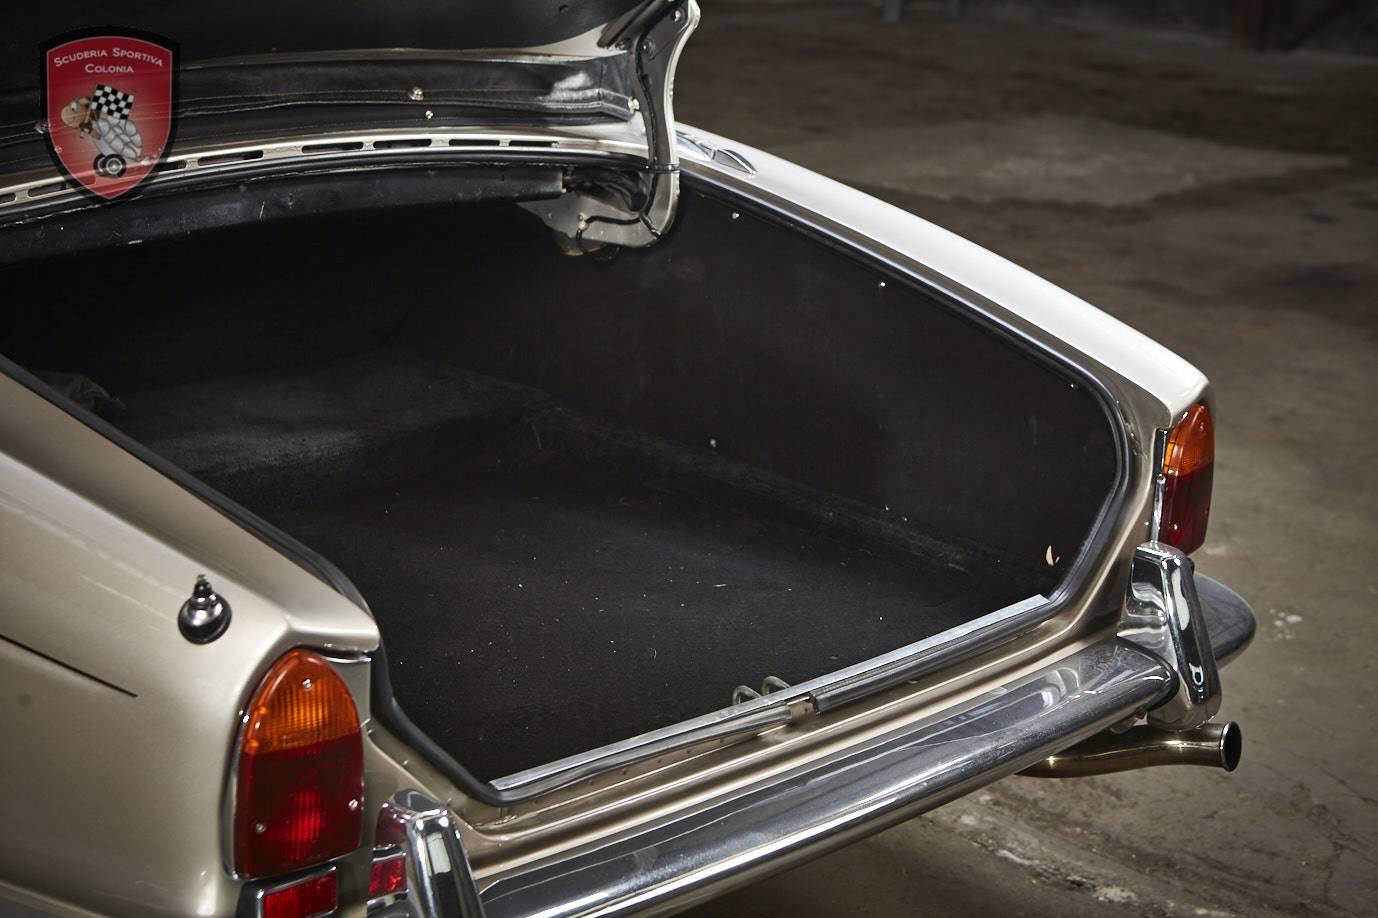 1974 Jaguar XJC 5.3 convertible For Sale (picture 6 of 6)